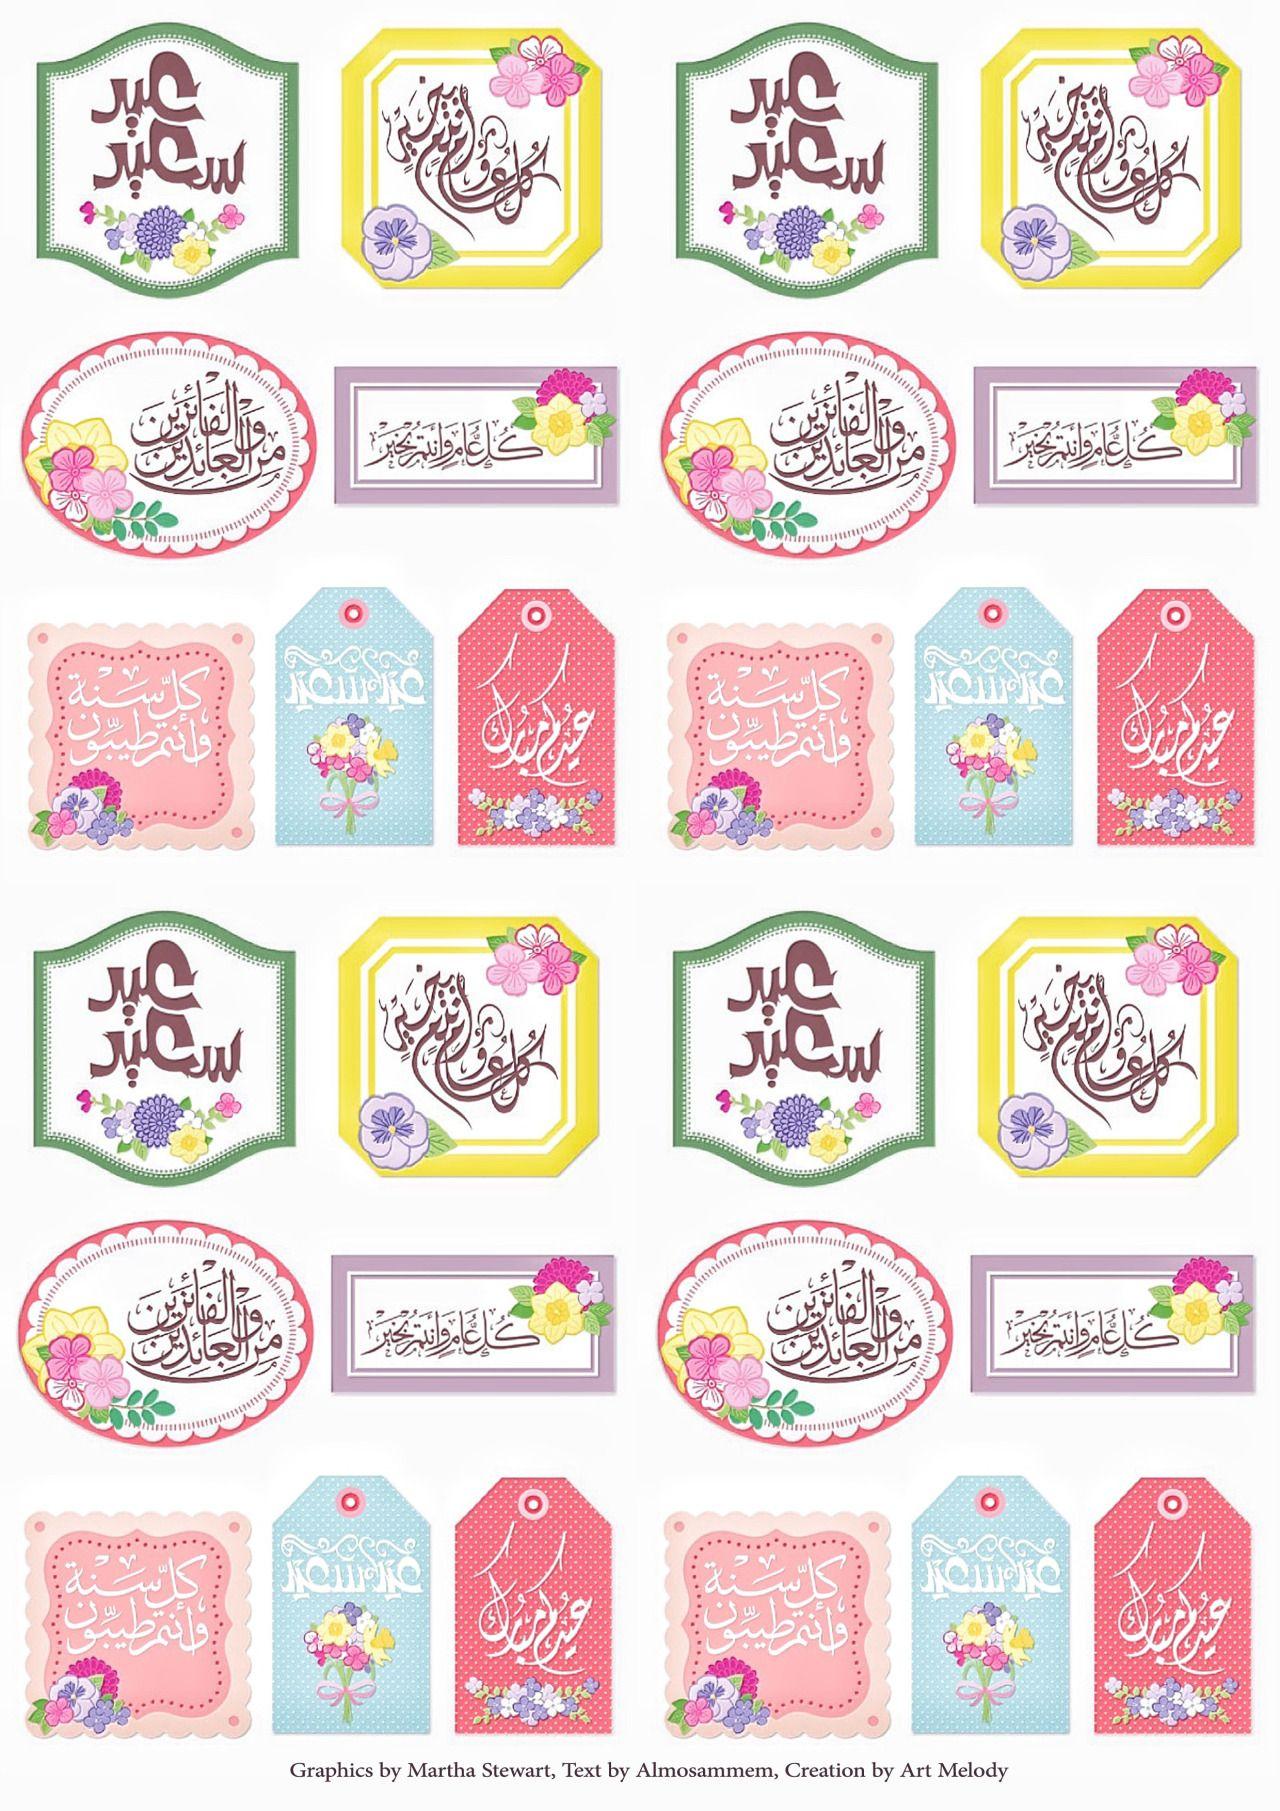 Ideas For Eid أفكار ومطبوعات للعيد Eid Stickers Eid Crafts Ramadan Crafts